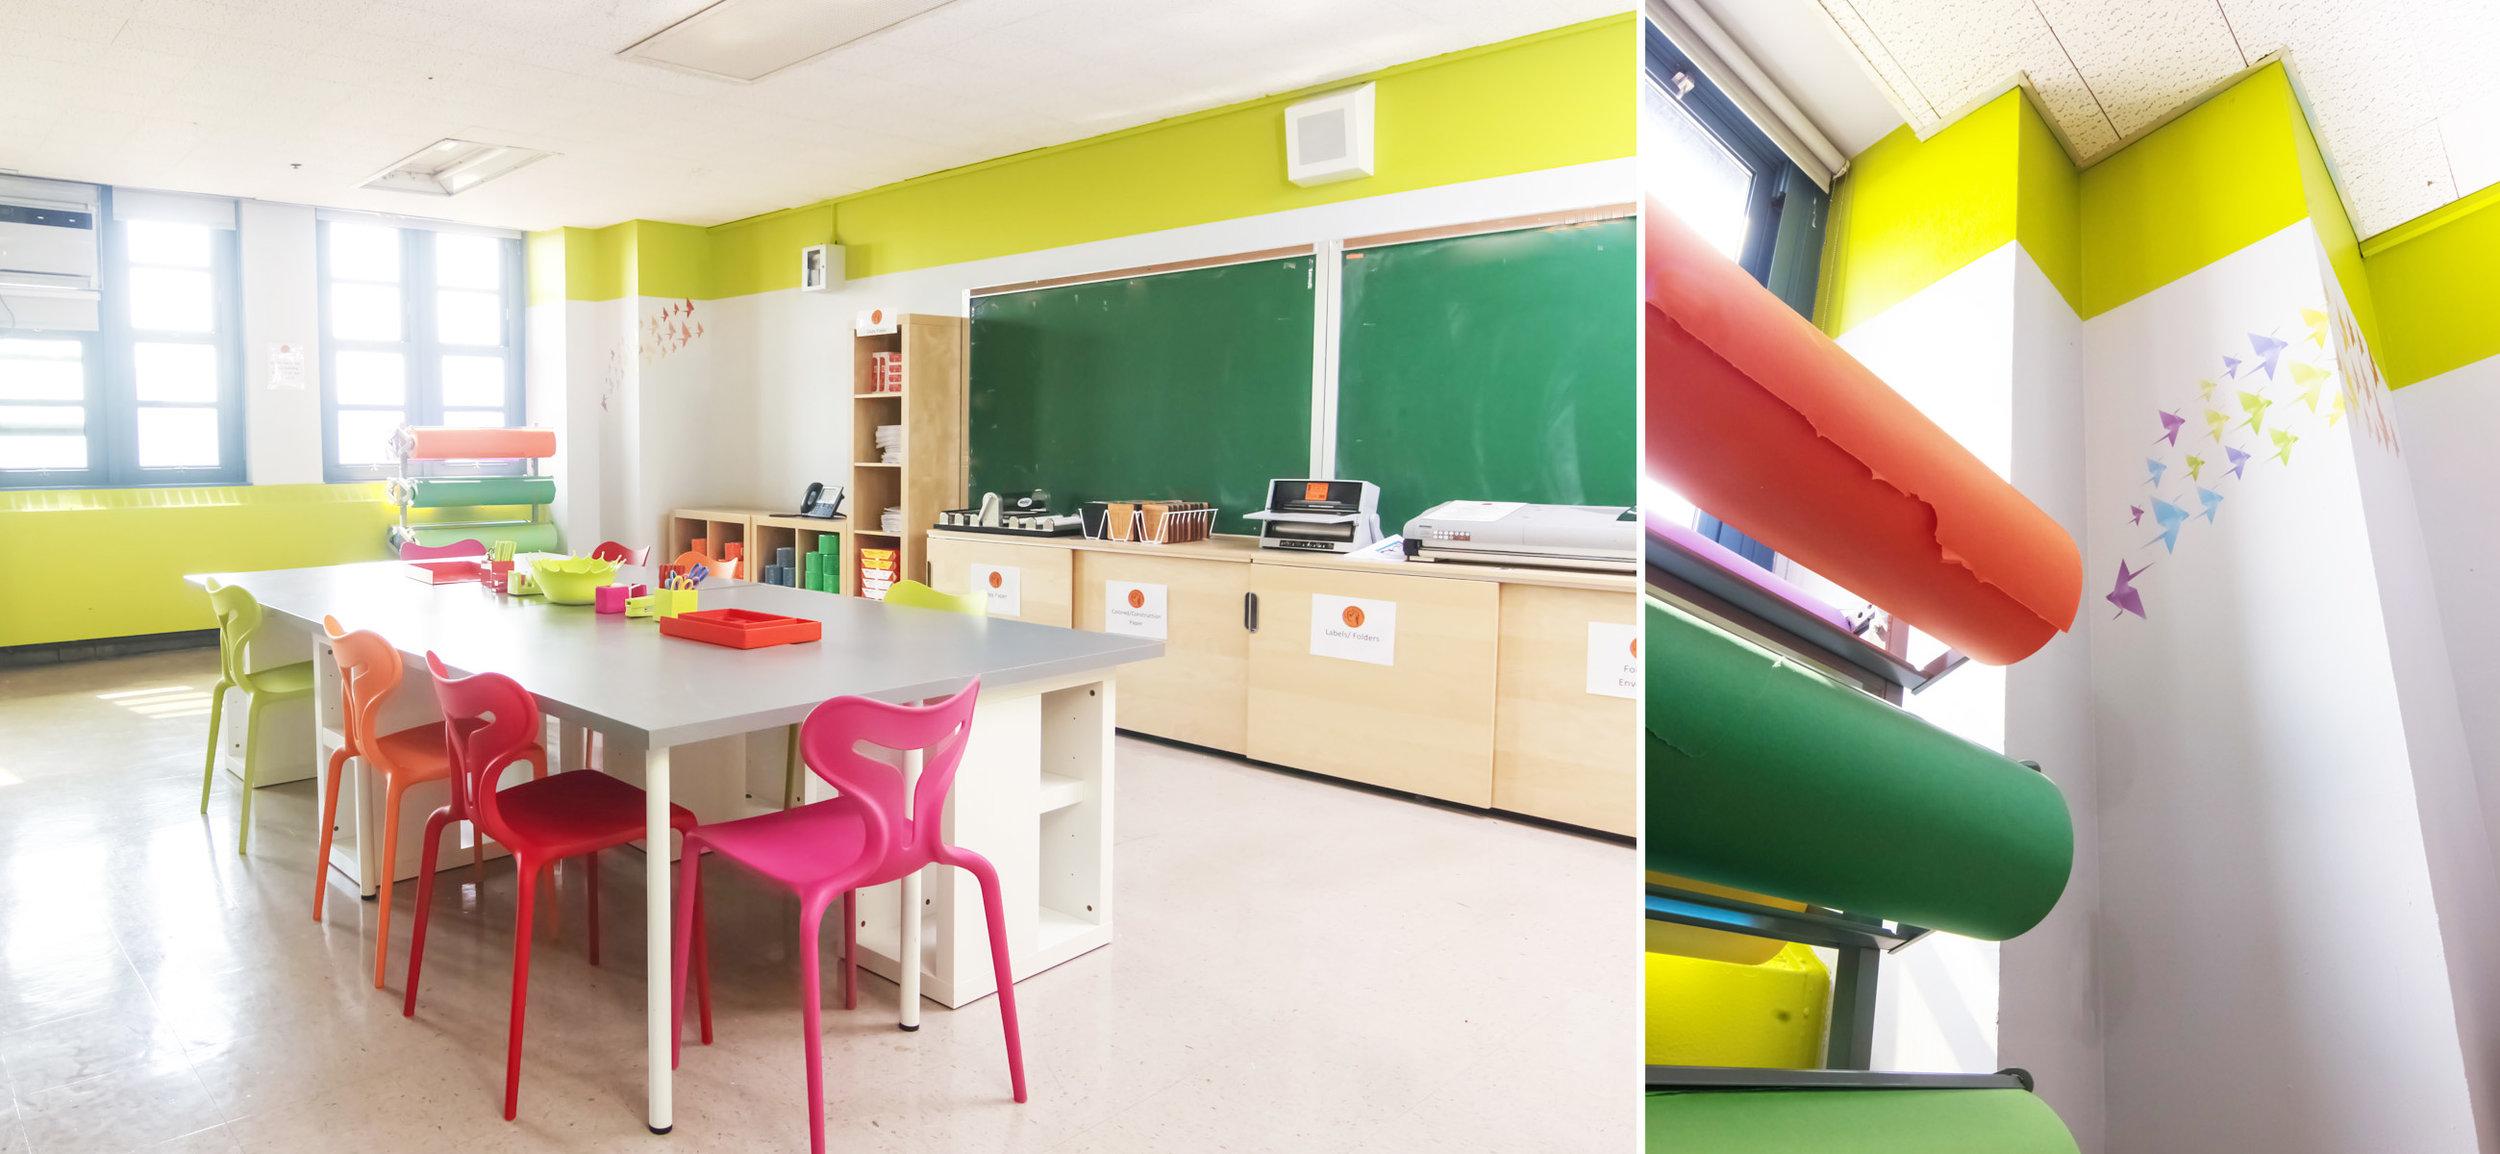 Teachers_Workroom_ReDesign.jpg